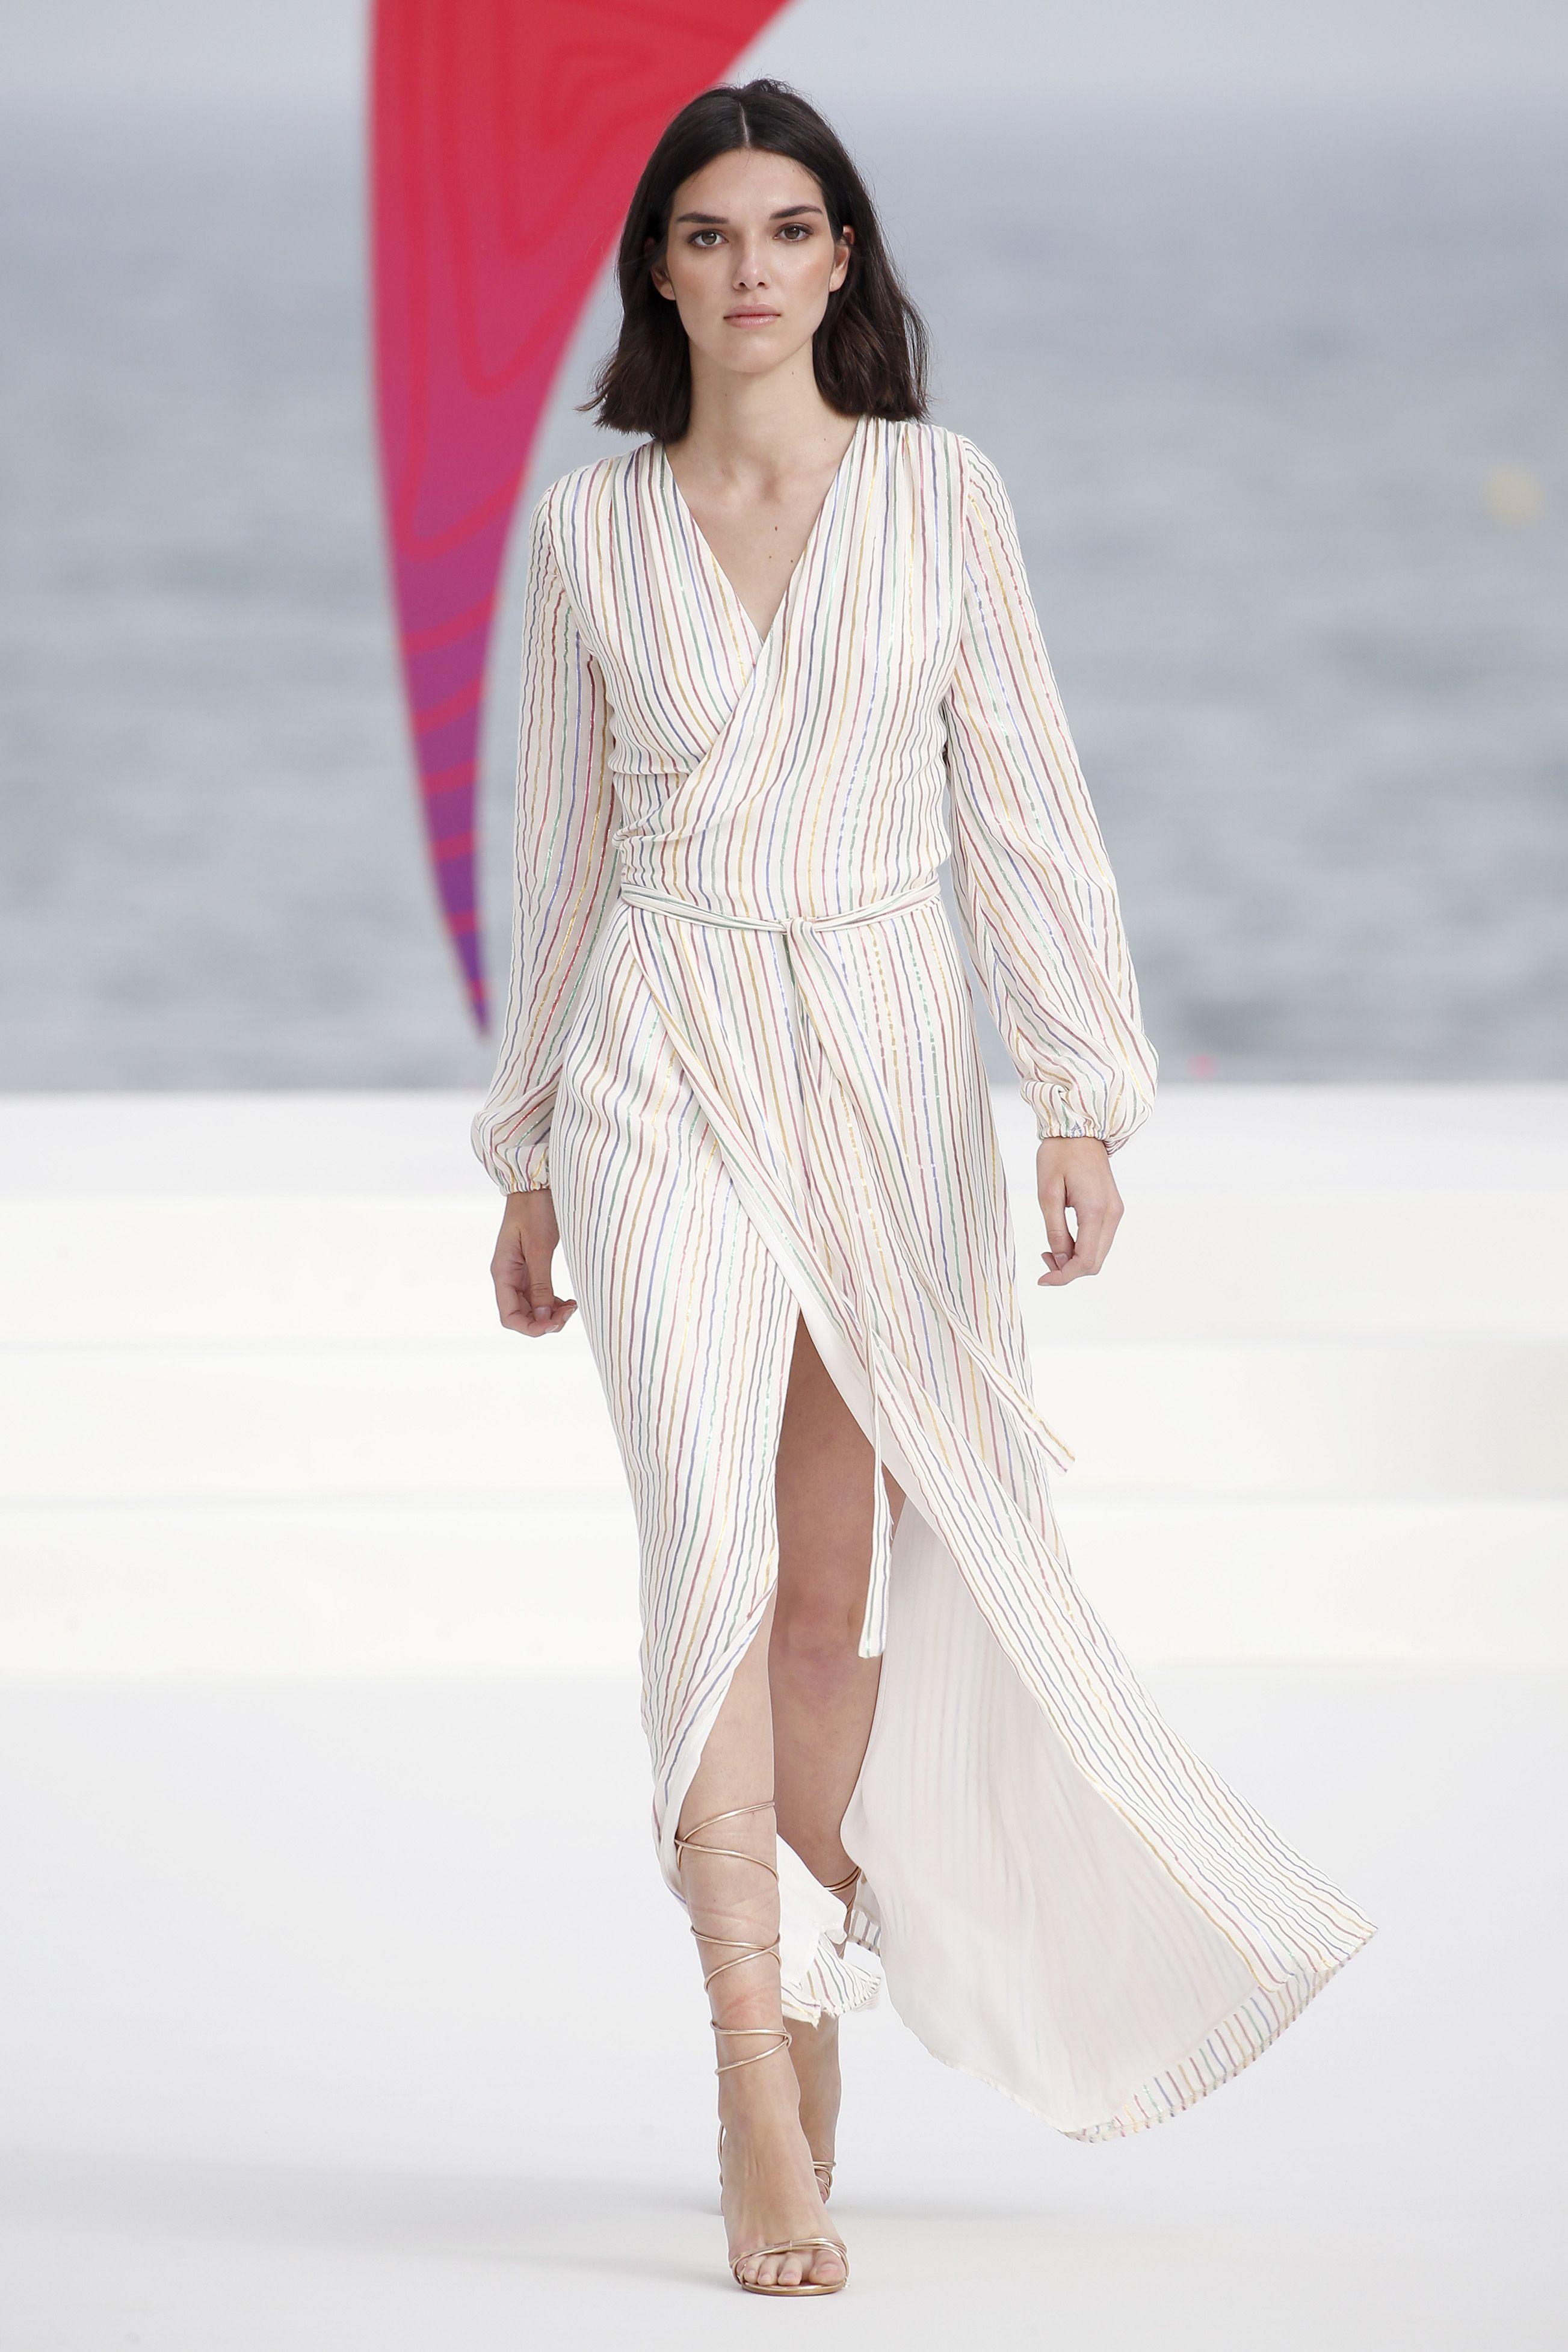 062af3d15 https://www.elle.com/es/moda/compras-elle/g21334221/vestidos-de ...